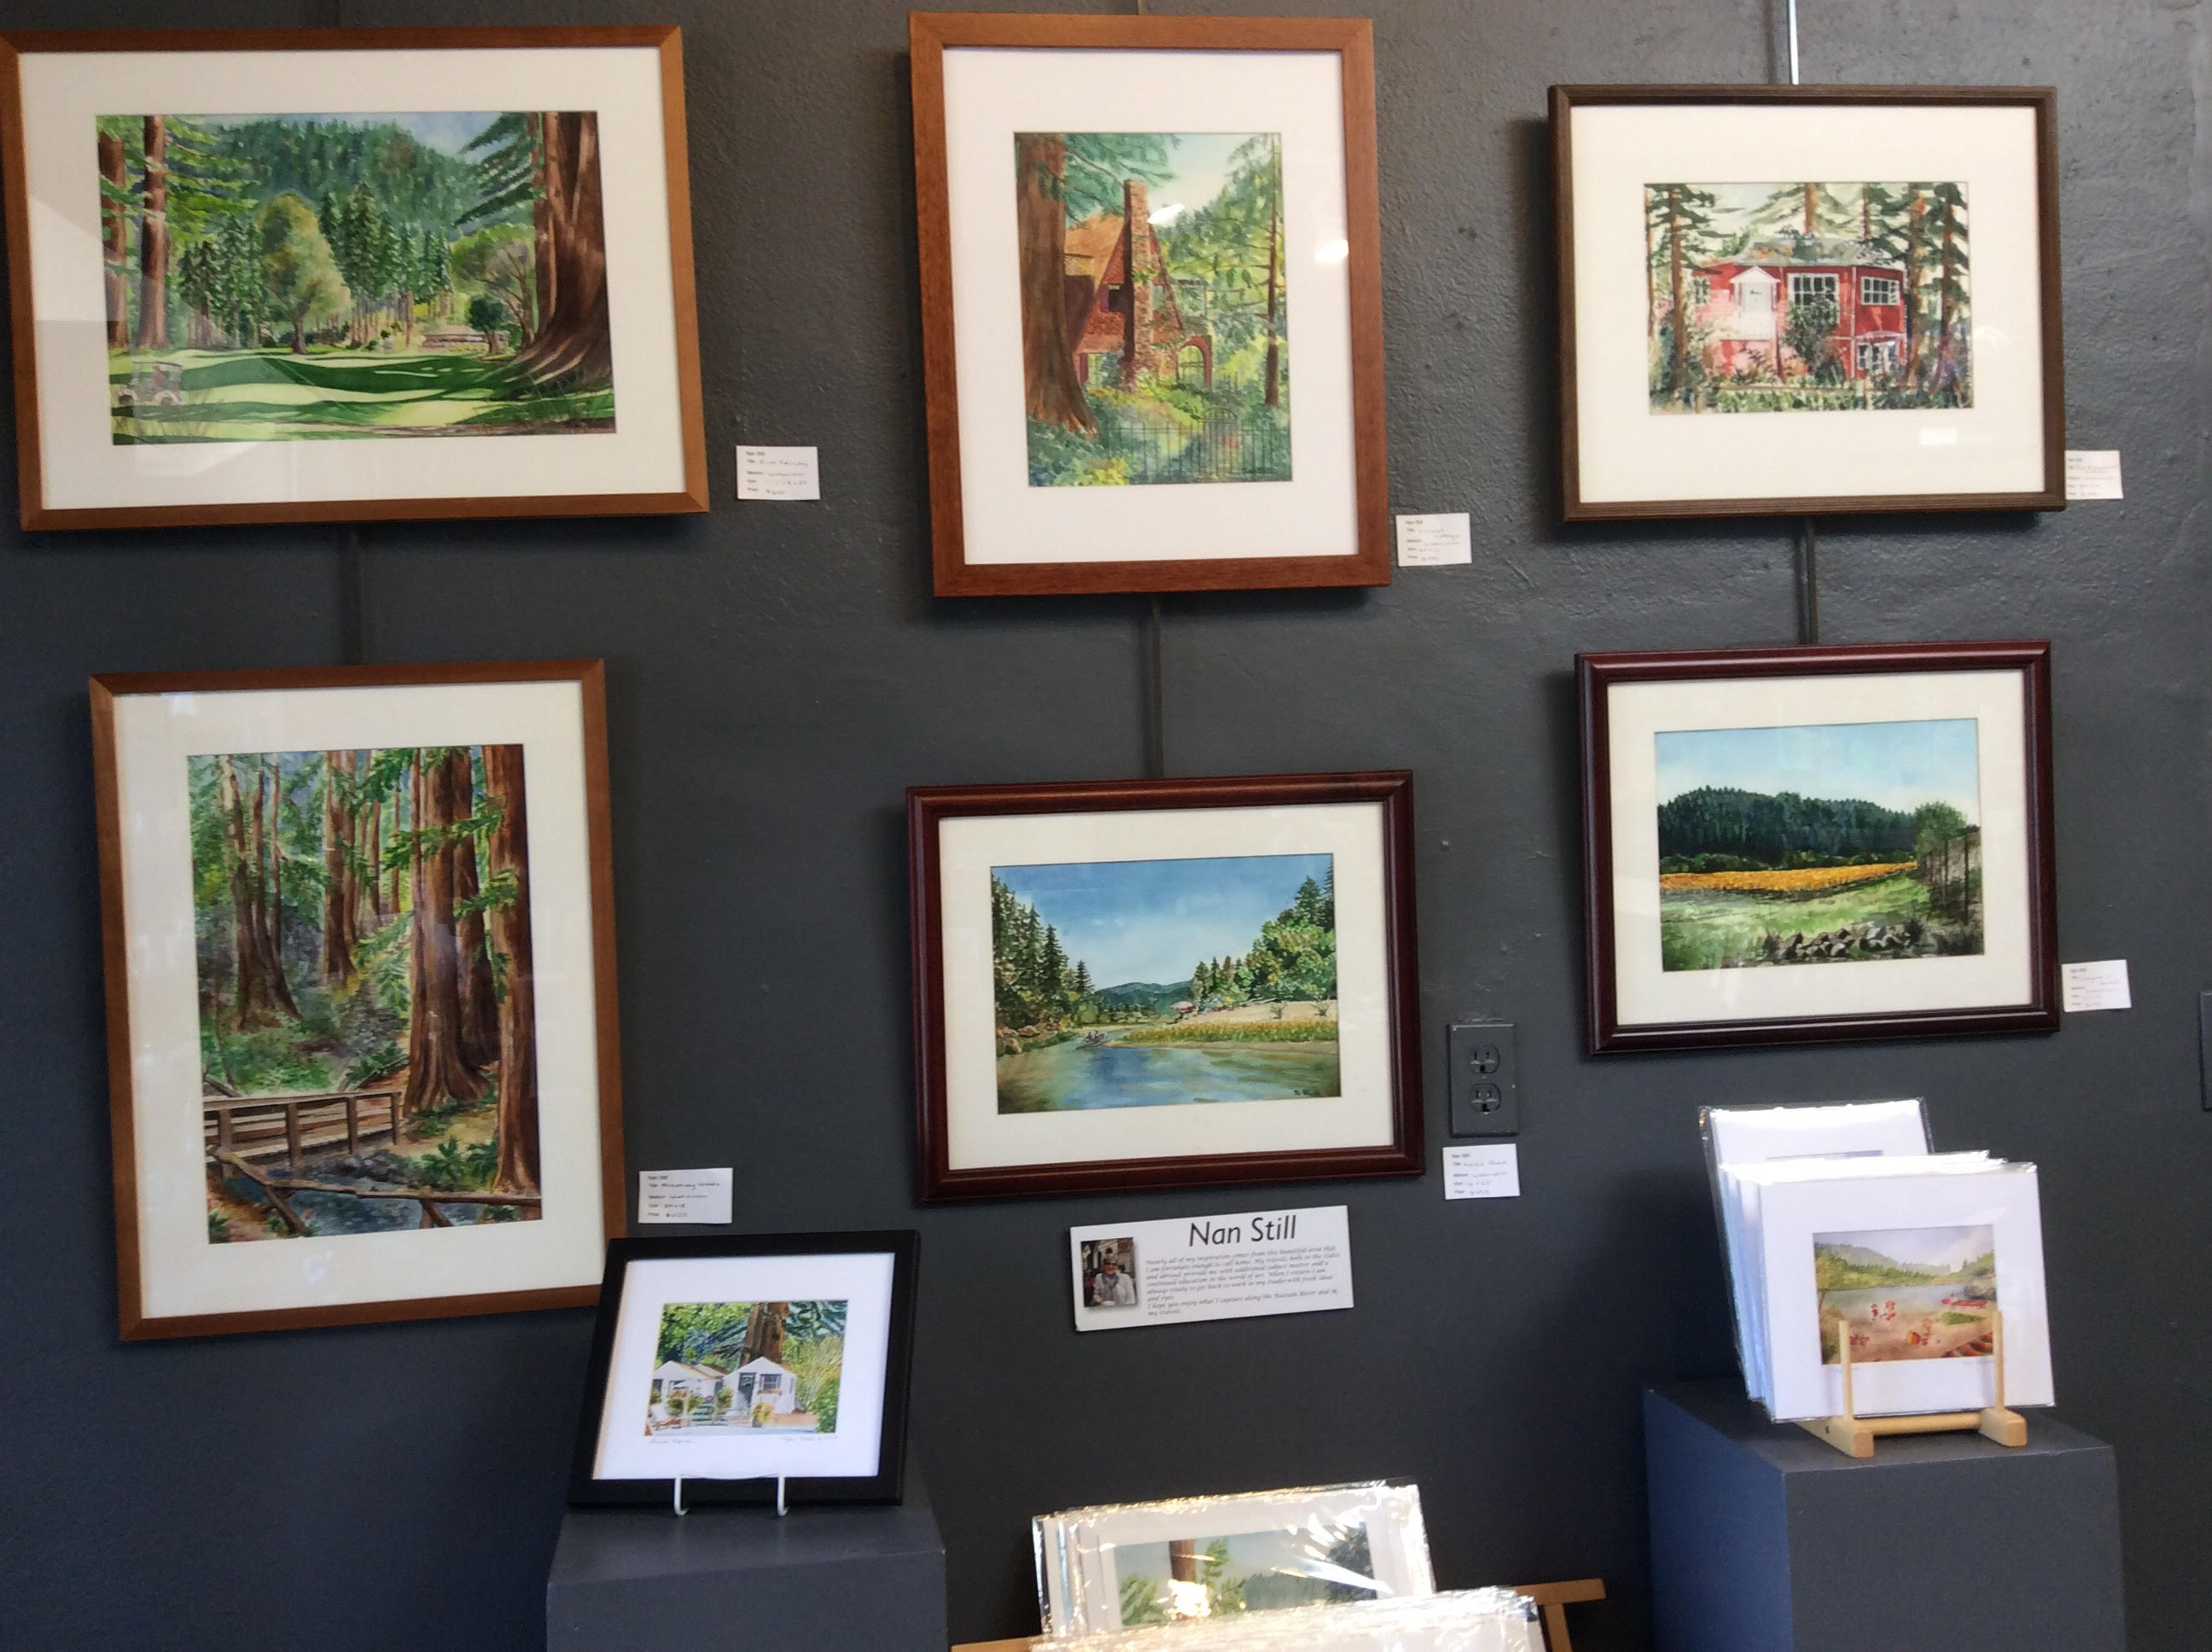 Russian River Art Gallery, Guerneville, California